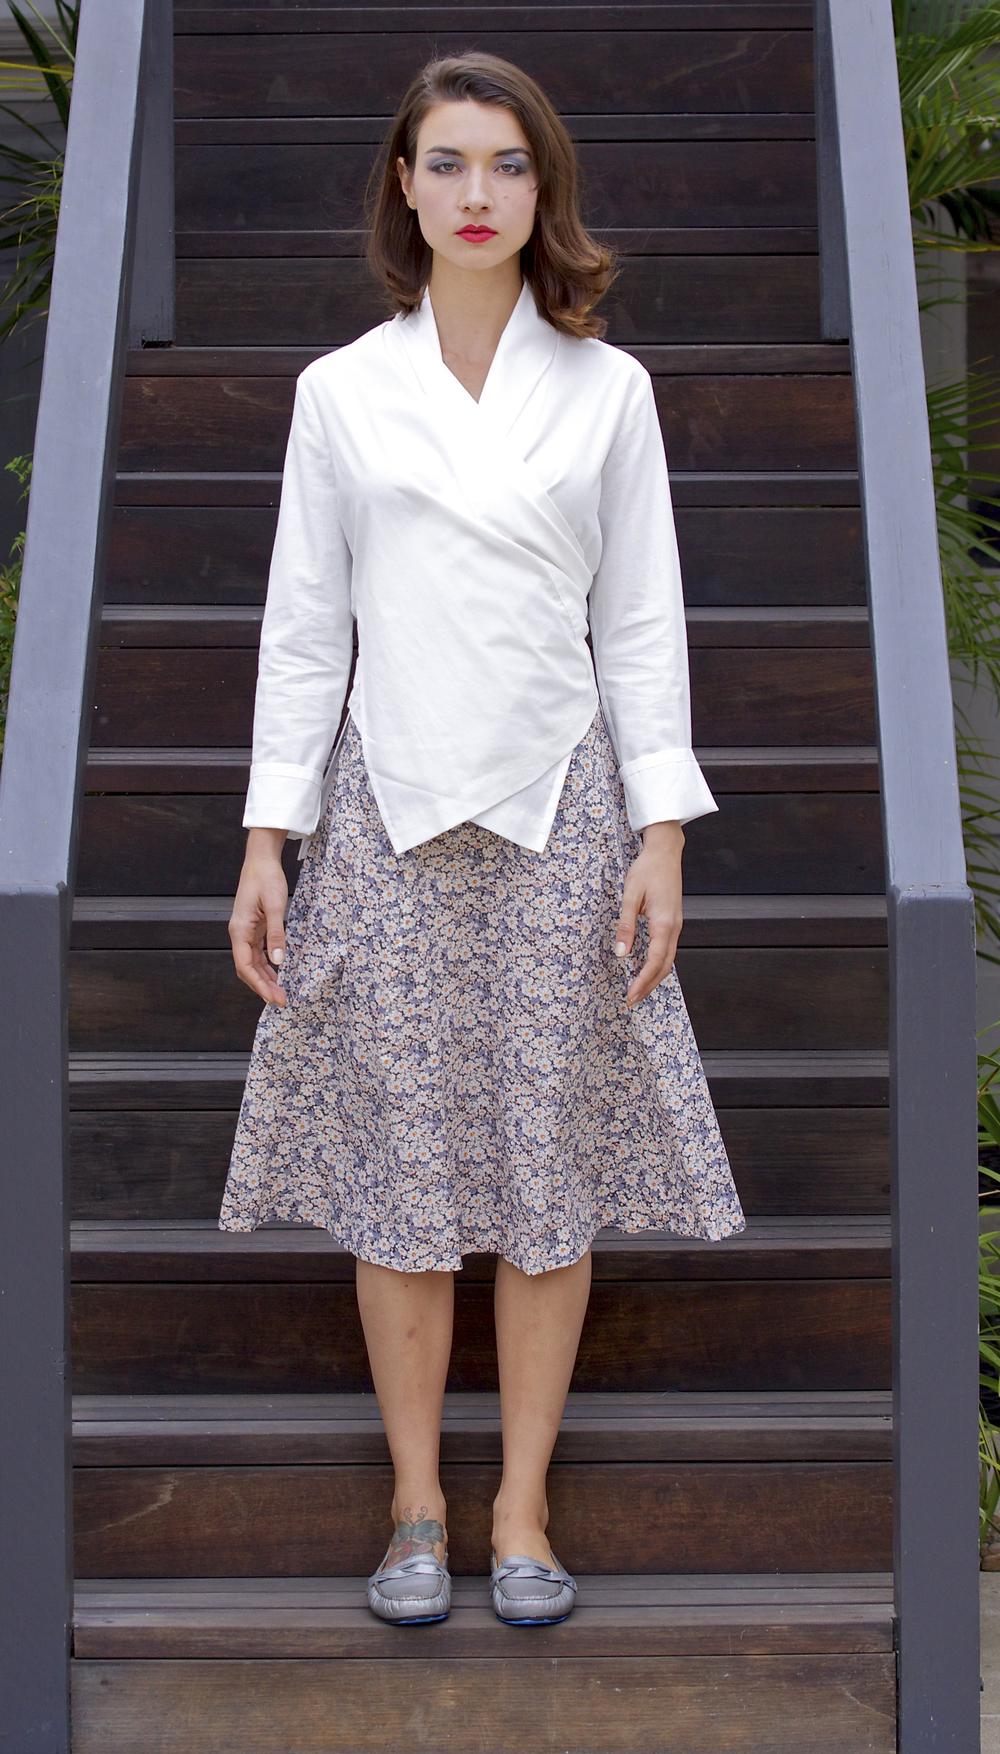 White Cotton Wrap Shirt, Liberty Swing Skirt